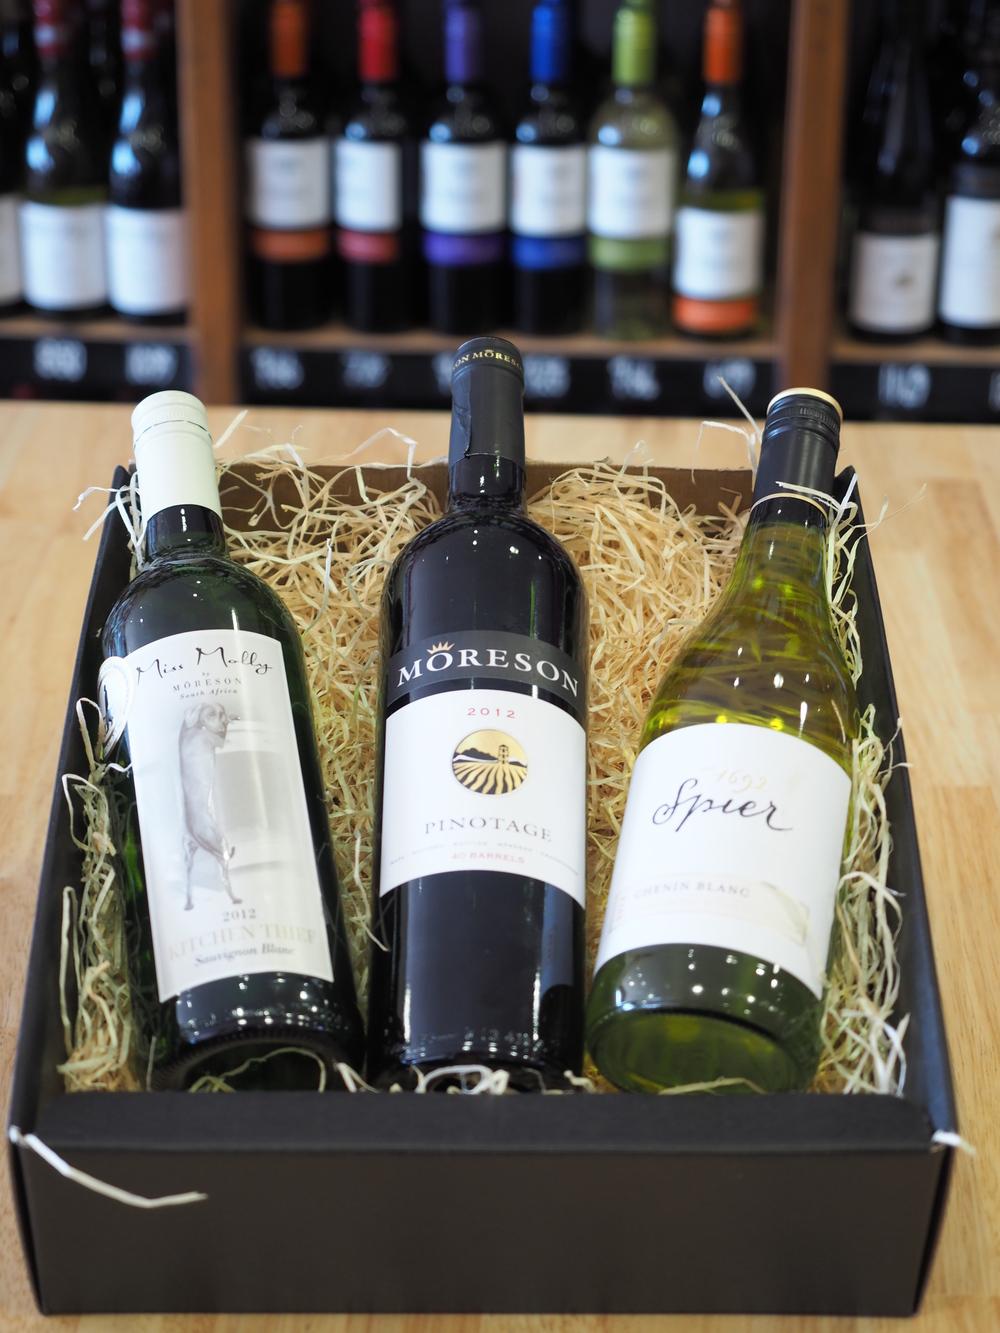 Wine-South Africa.JPG